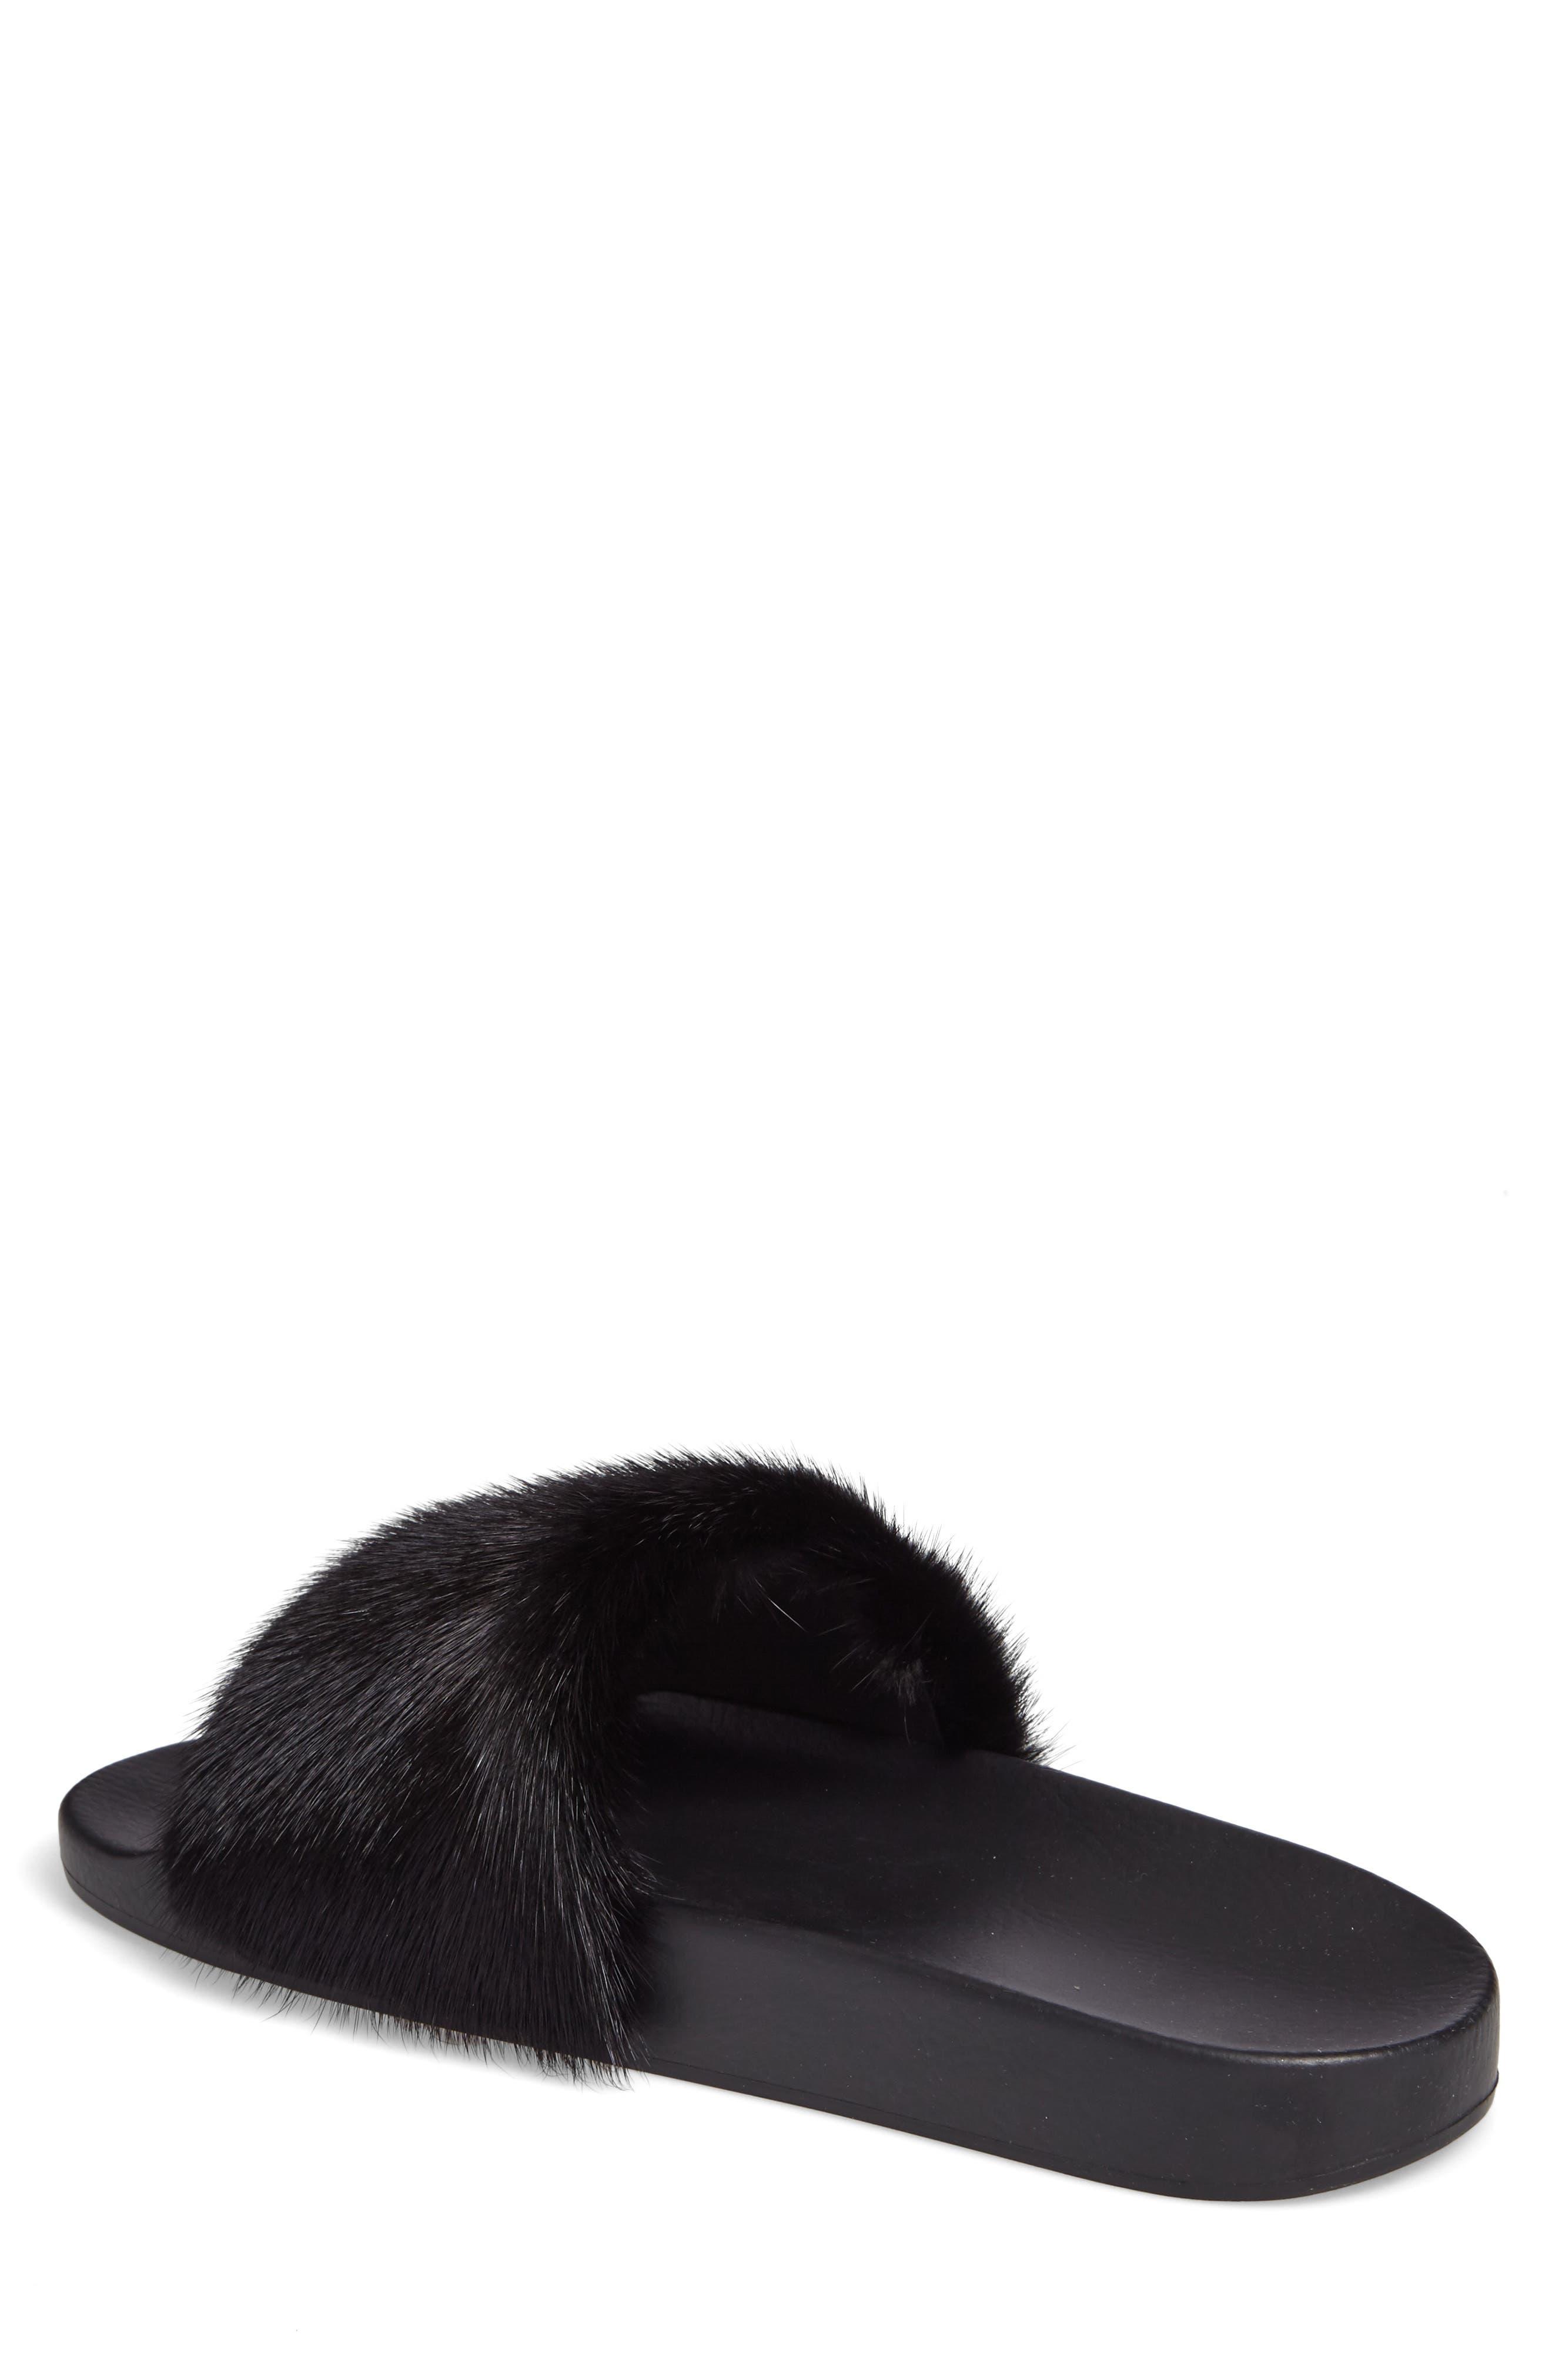 Genuine Mink Fur Slide Sandal,                             Alternate thumbnail 2, color,                             Black